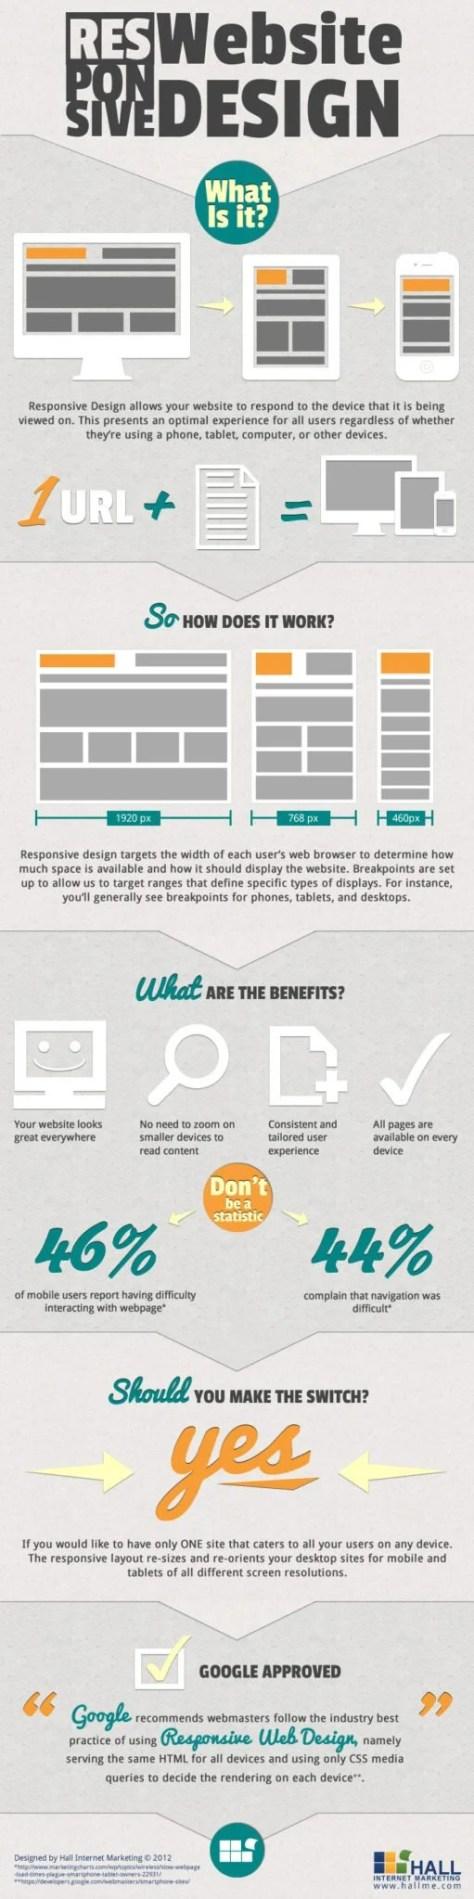 Infographic on Responsive Design